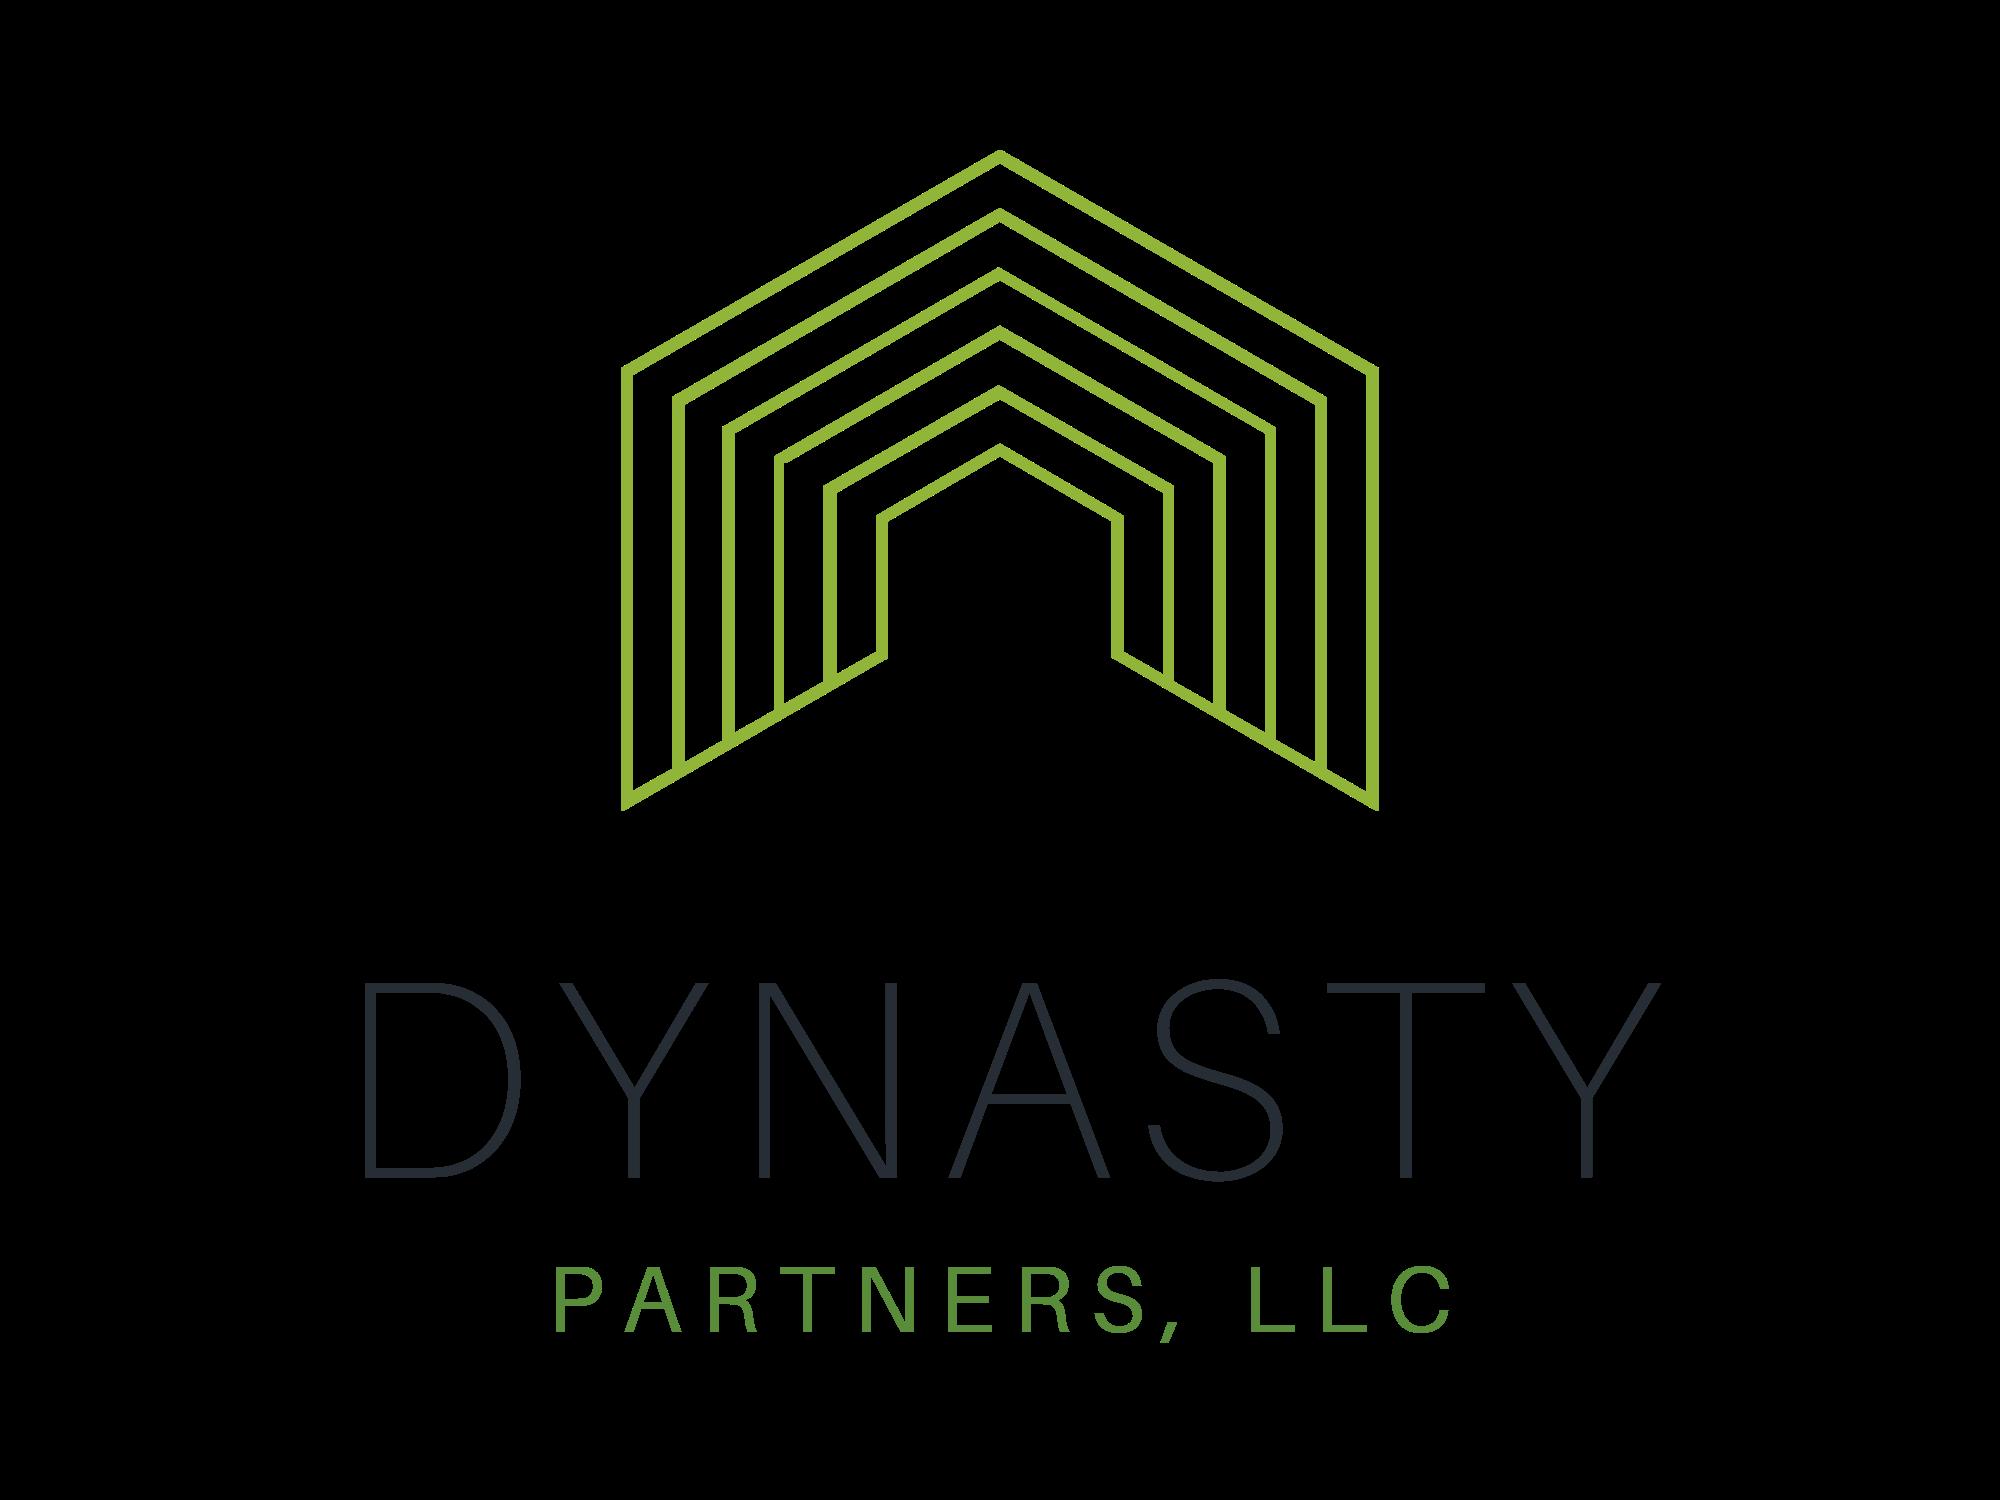 Dynasty Partners, LLC Logo.png